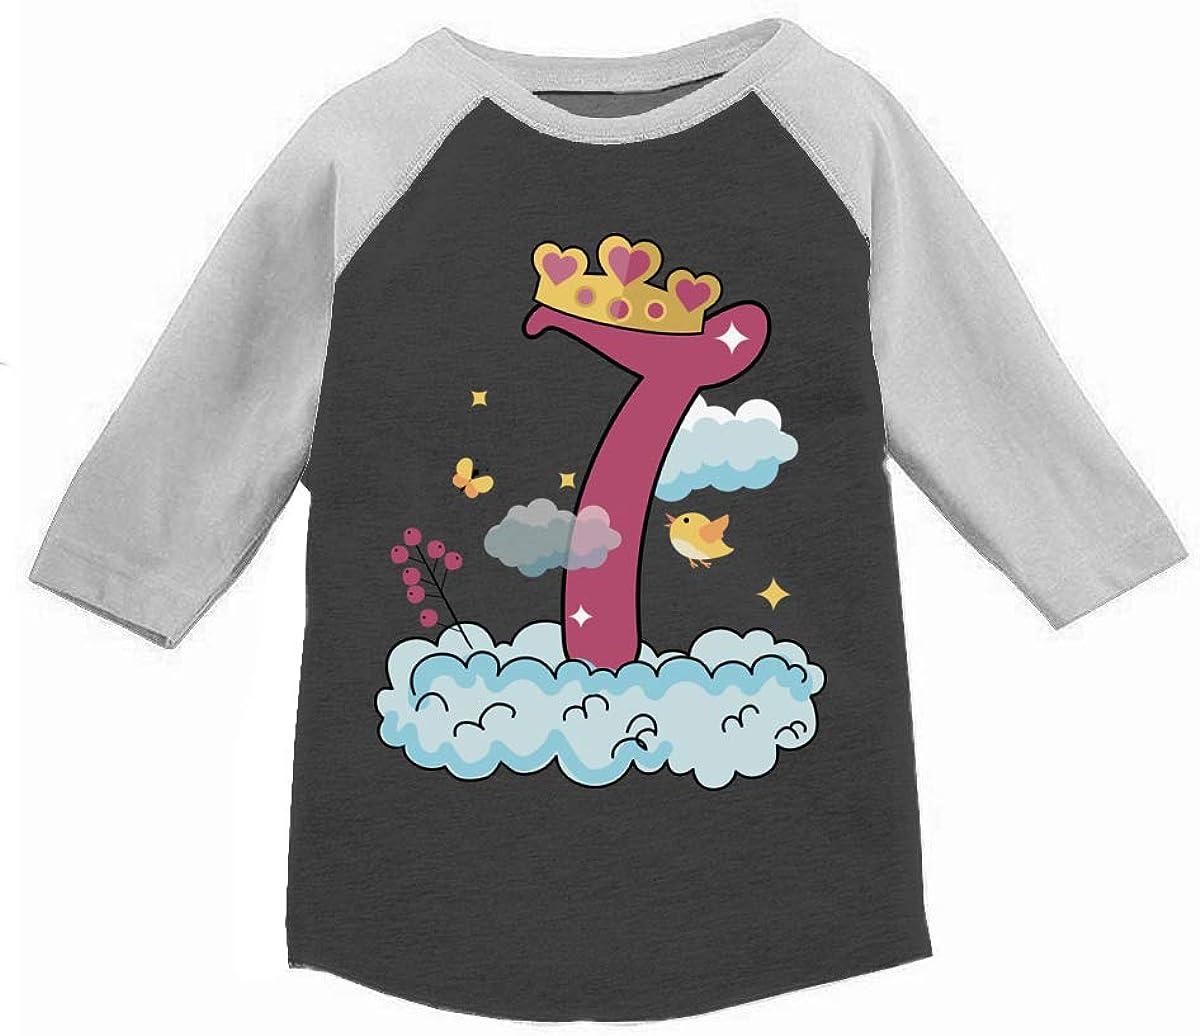 Awkward Styles 7th Birthday T-Shirt Princess Raglan Shirt Kids